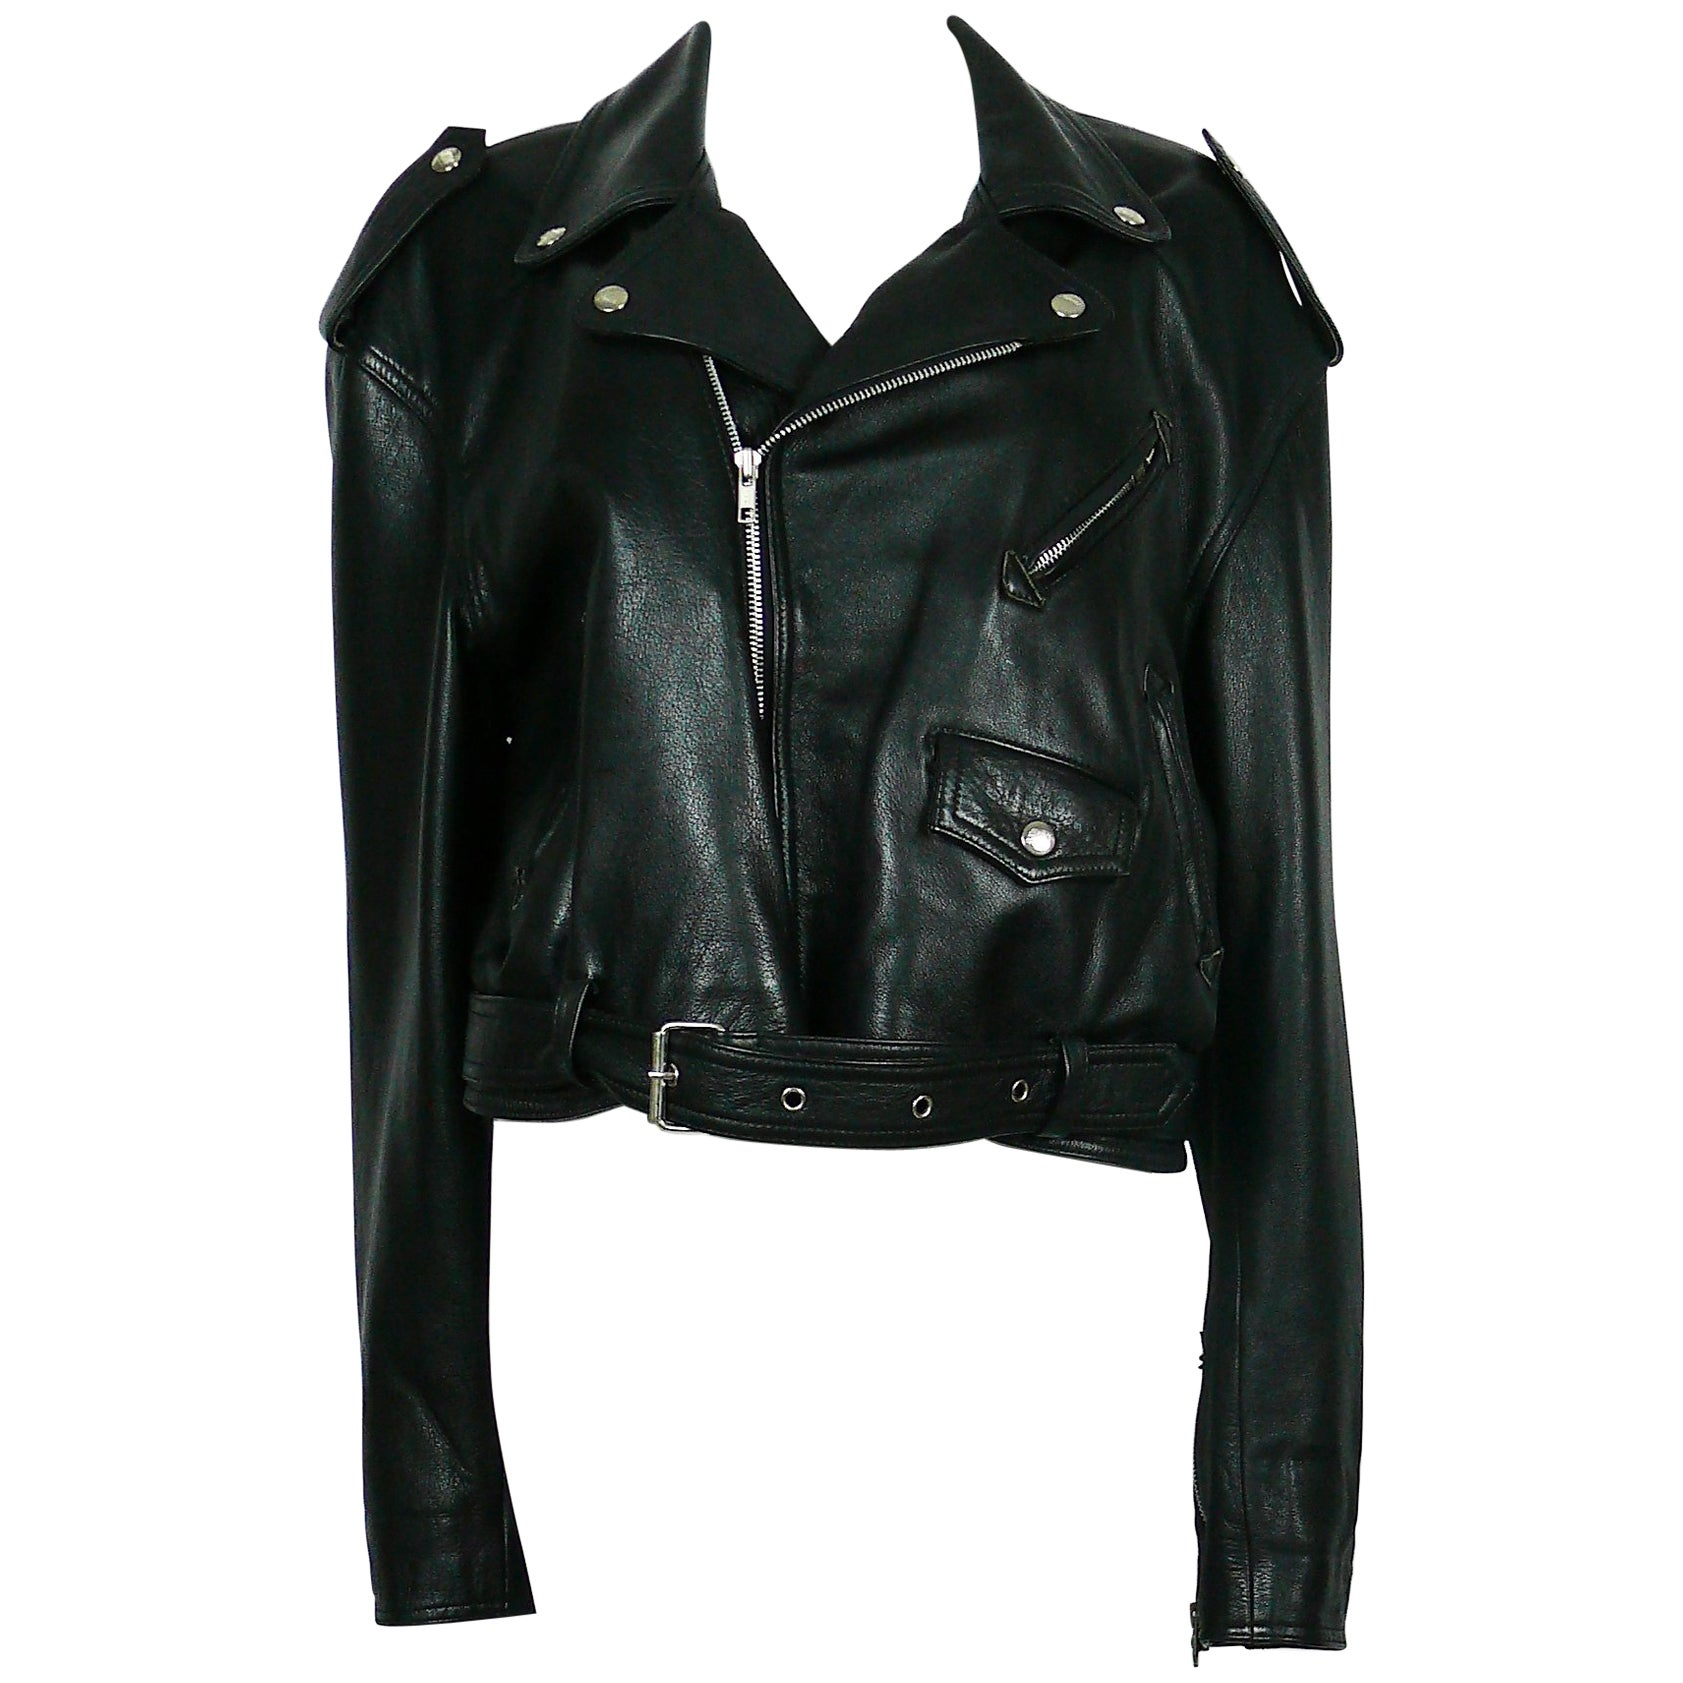 2ee9ae7de Jean Paul Gaultier Vintage Black Leather Perfecto Biker Jacket